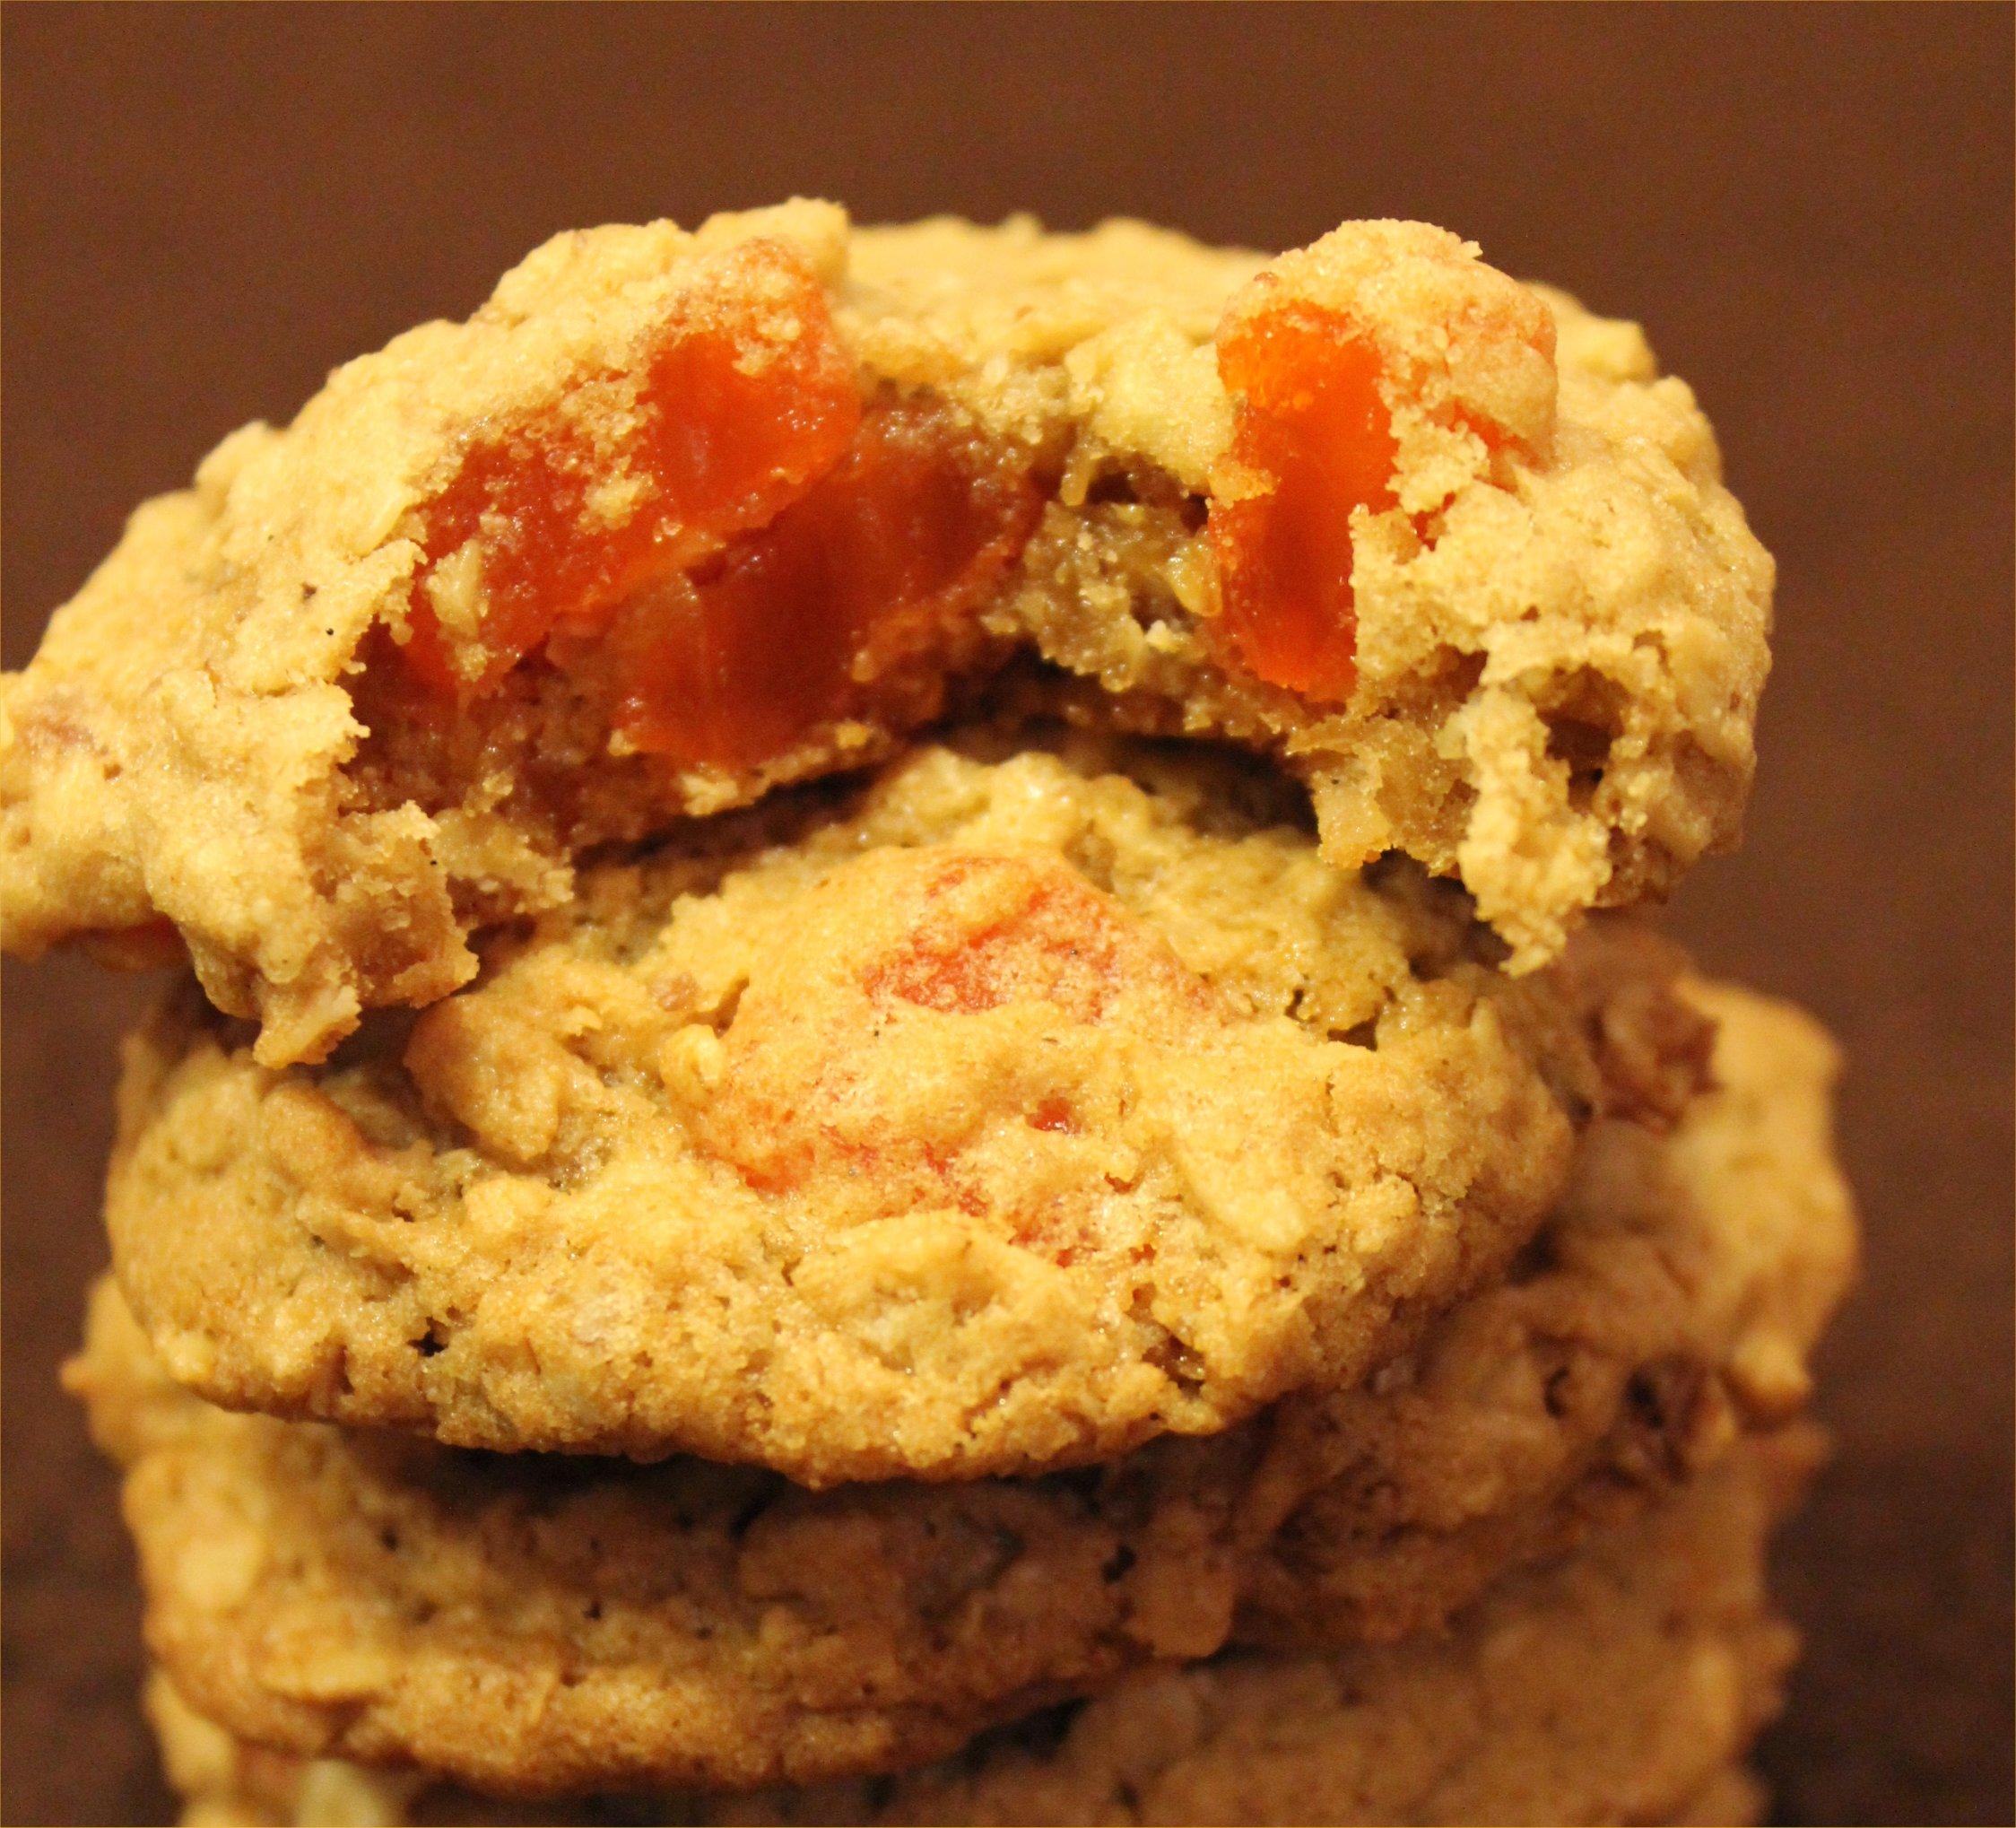 Miss Pat's Orange Slice Cookies | Inside NanaBread's Head